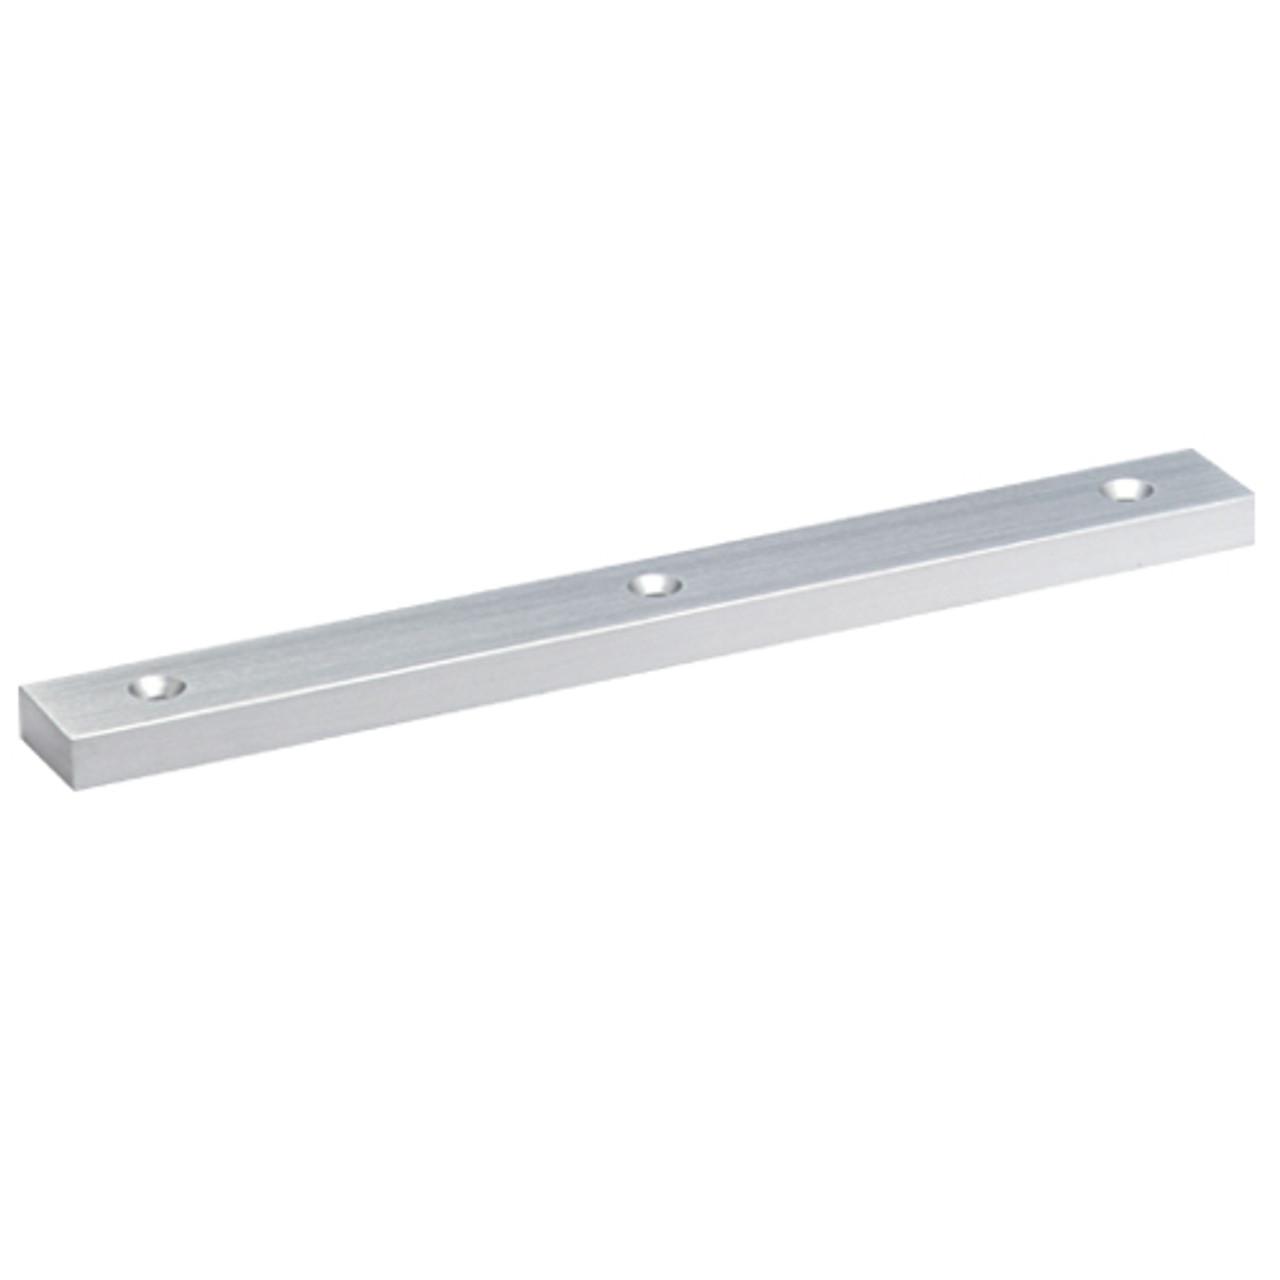 4311-US26 DynaLock 4000 Series Filler Plates for Single Maglocks in Bright Chrome